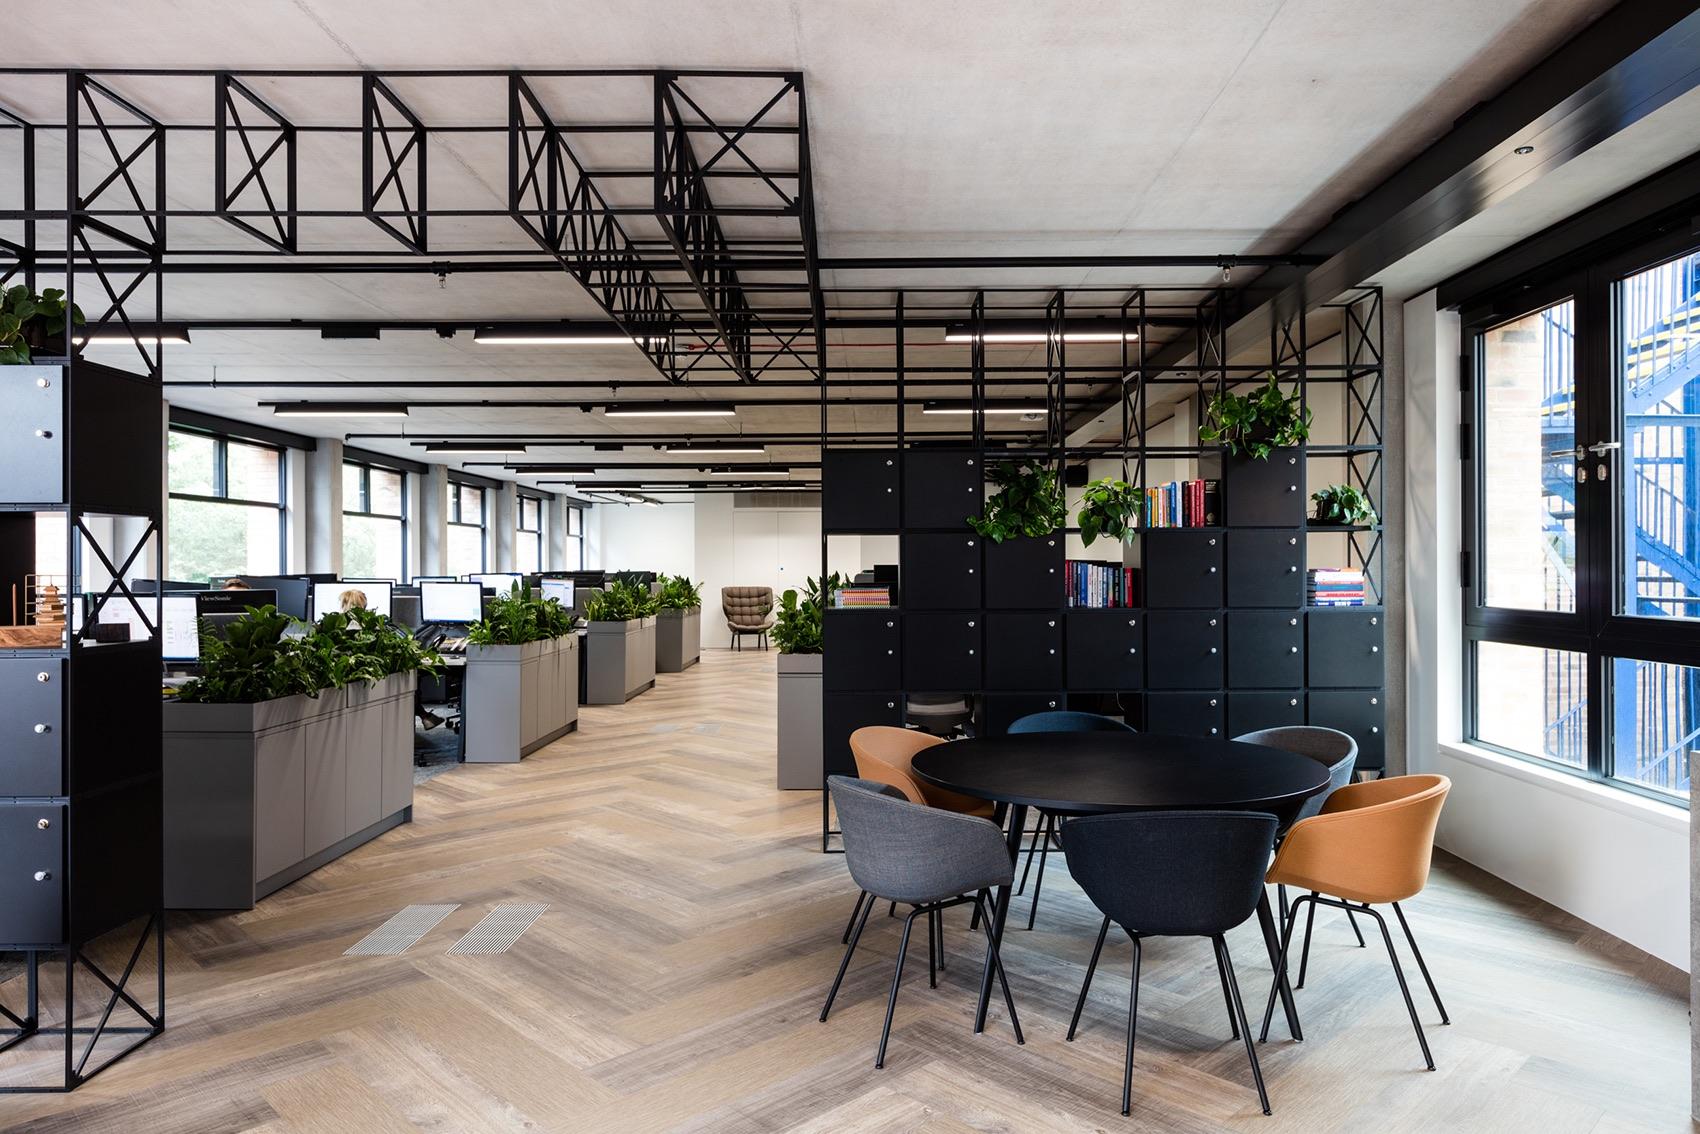 albion-capital-london-office-11